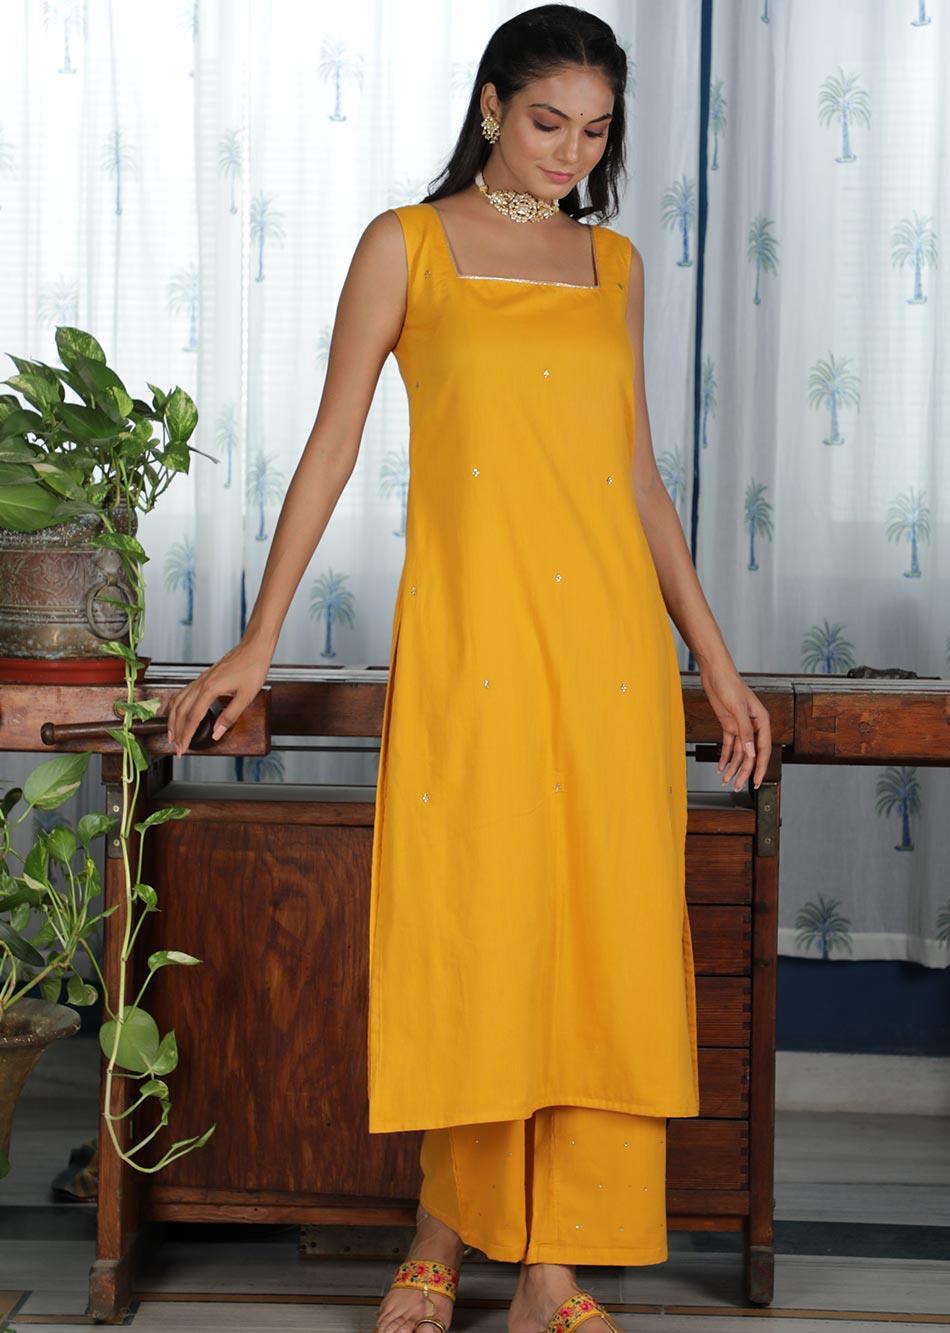 MOH Honey Straight Kurta (only kurta) By Jovi Fashion